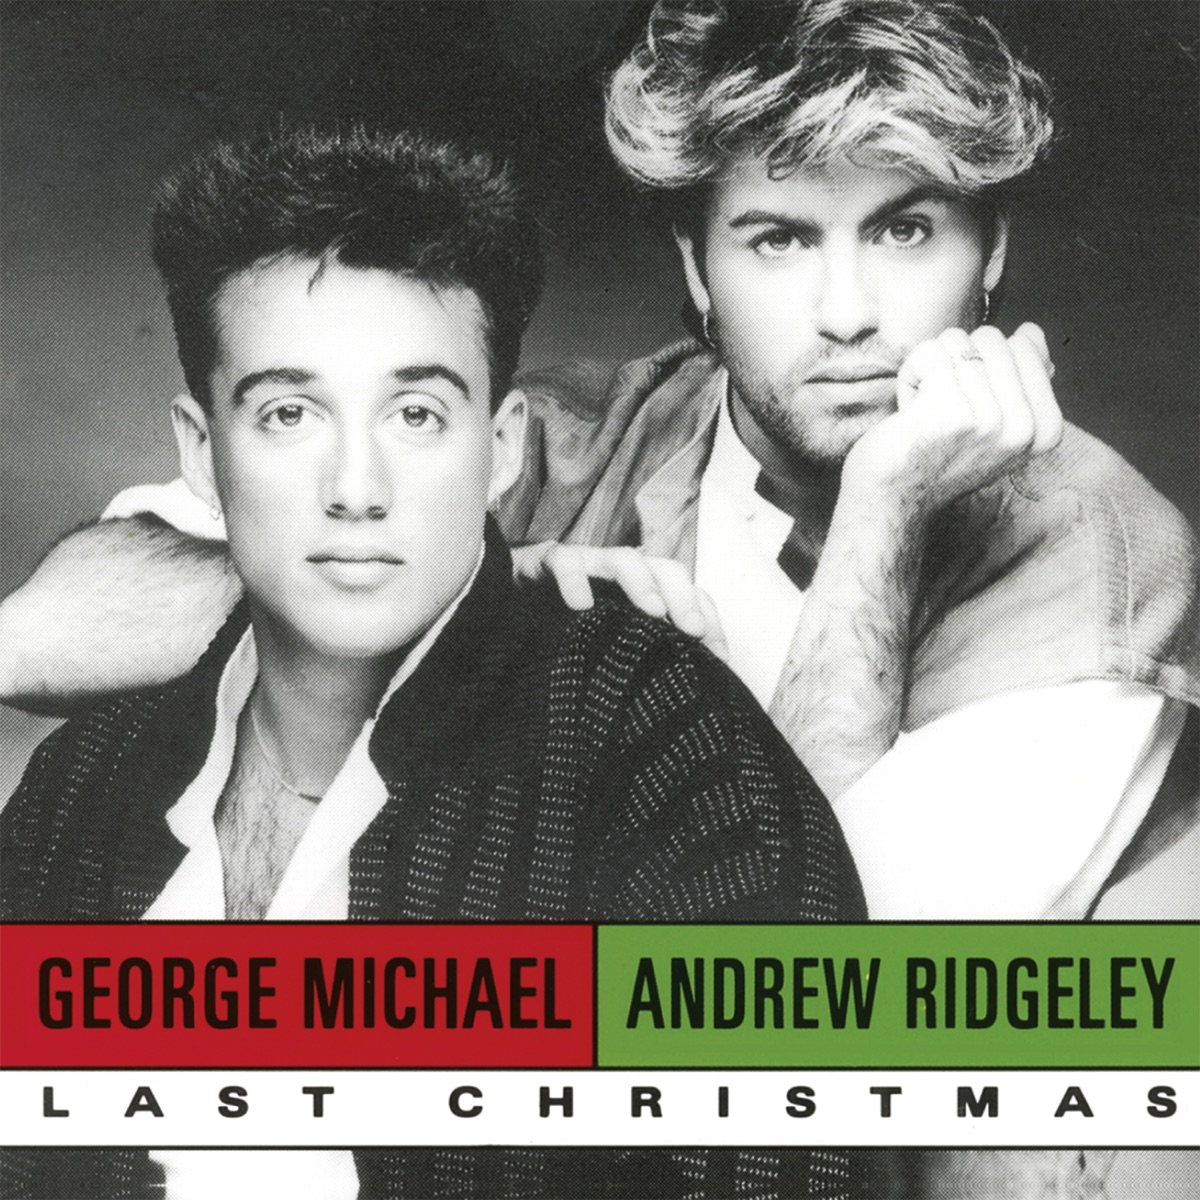 Last Christmas Album Cover.Last Christmas Single Album Cover By Wham